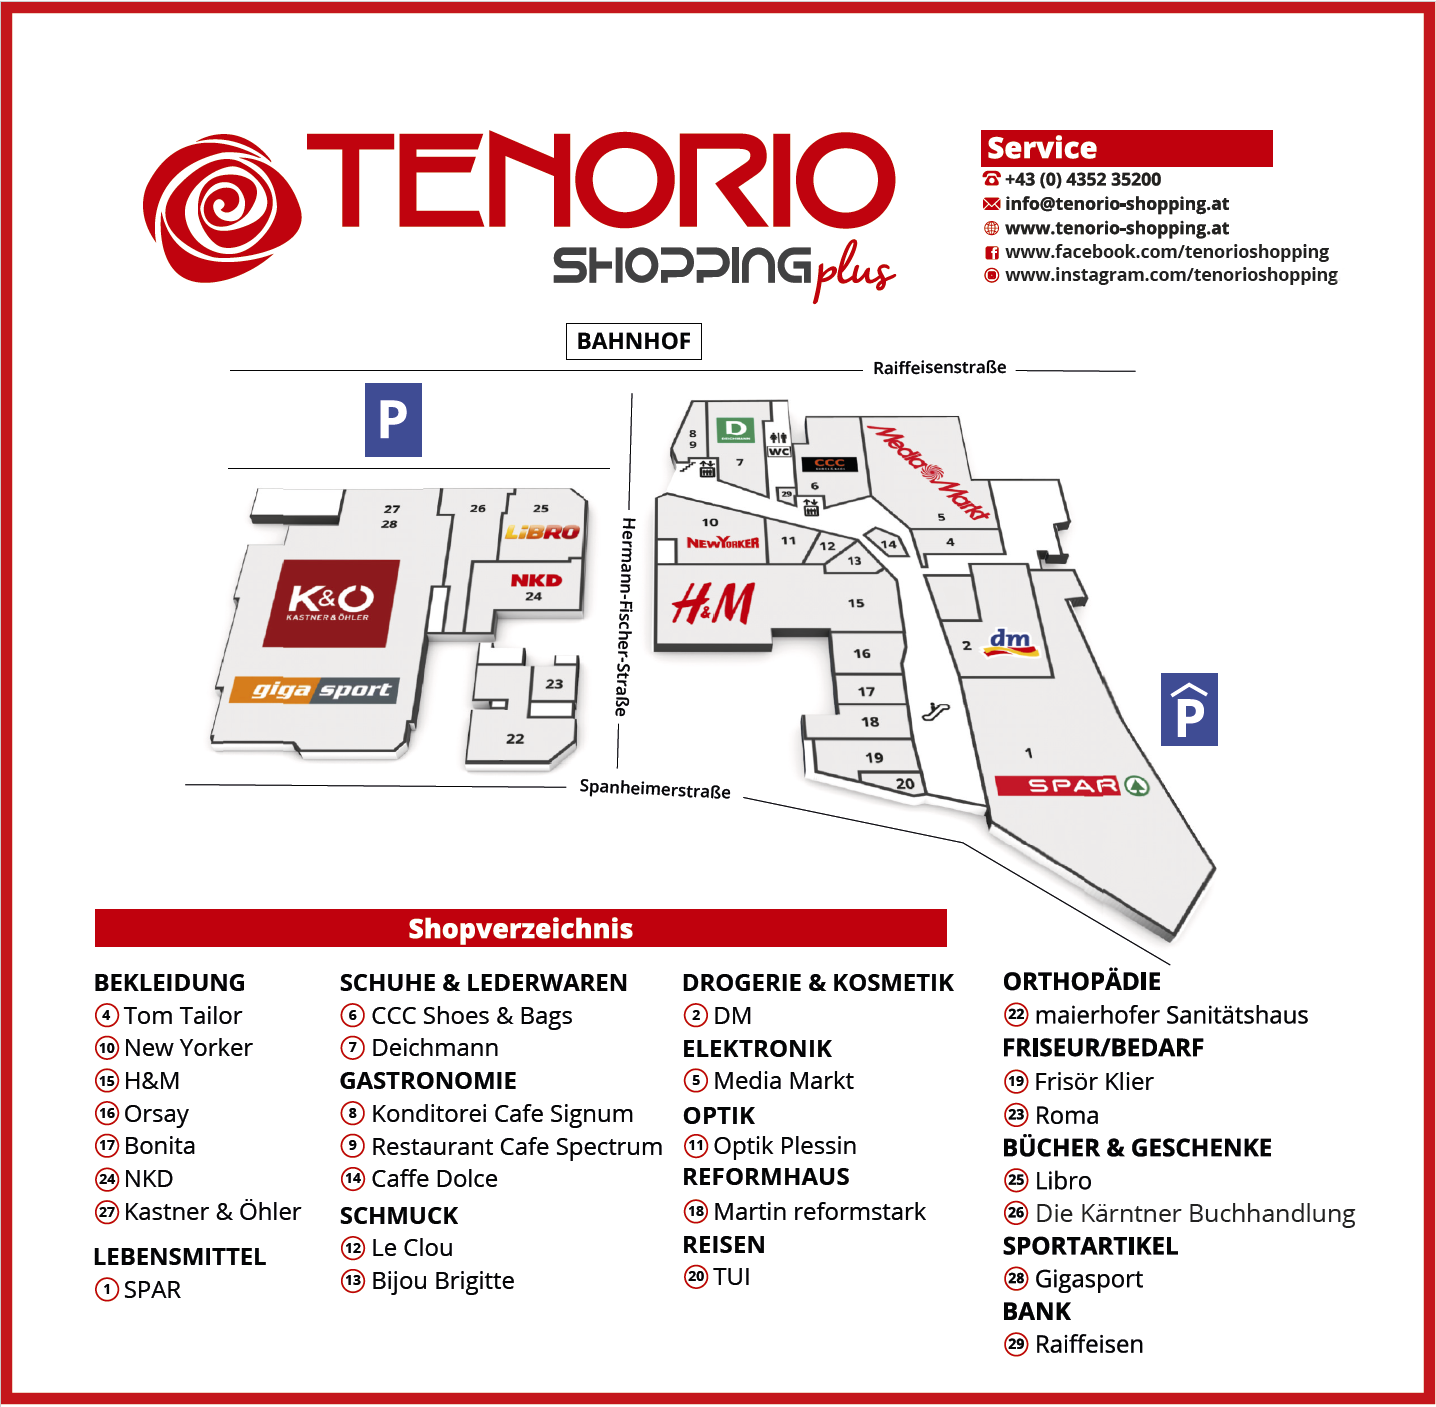 Tenorio Shopping Plus - Shopplan